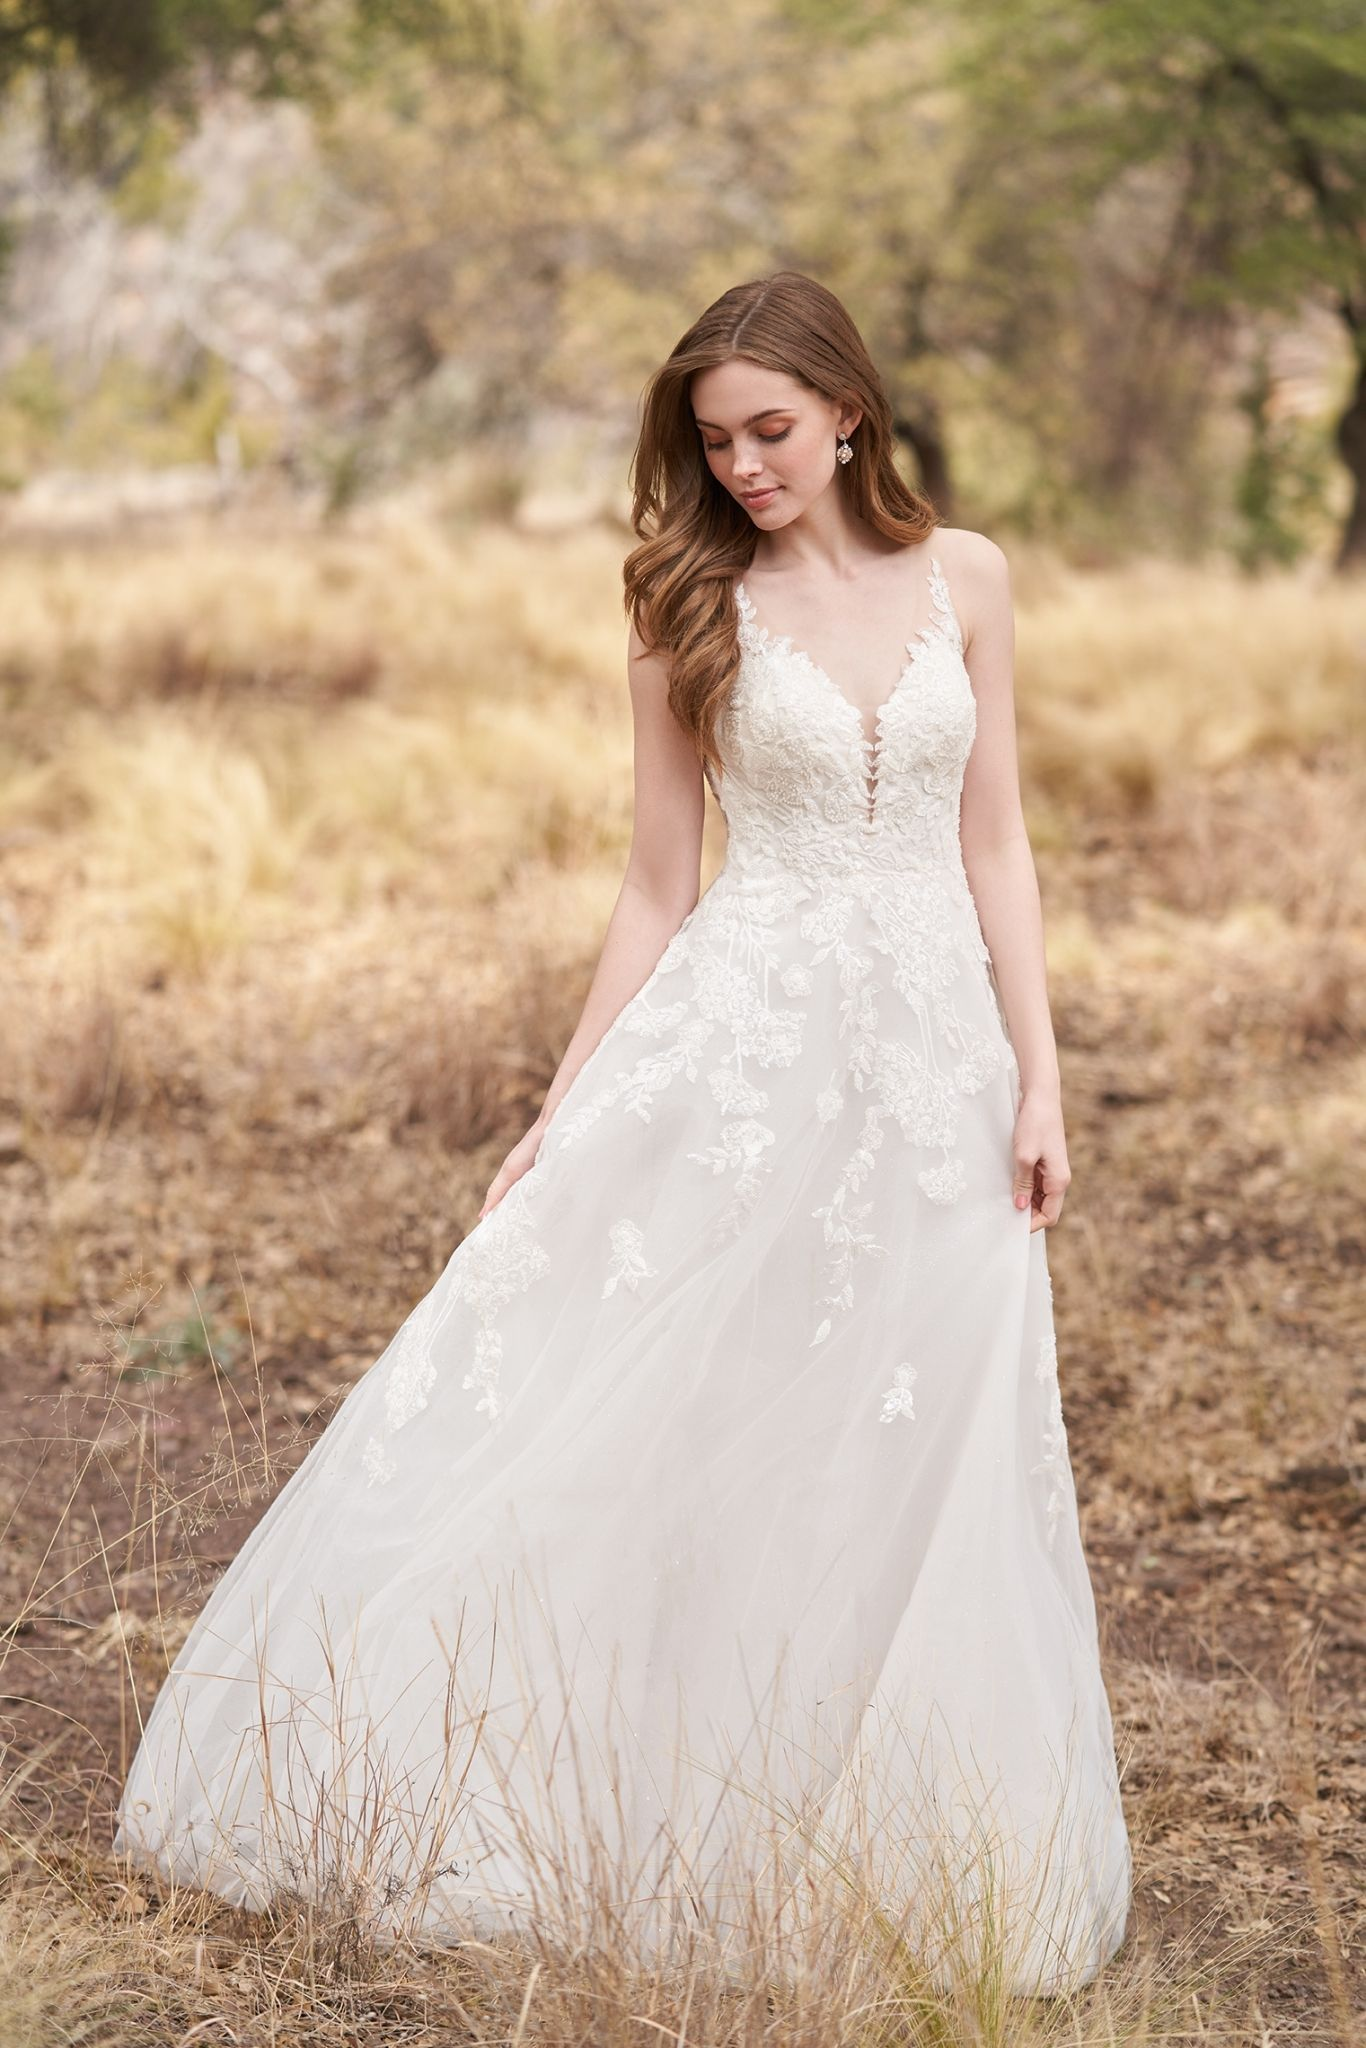 Dana 25598 in 2020 Antique lace wedding dress, Allure